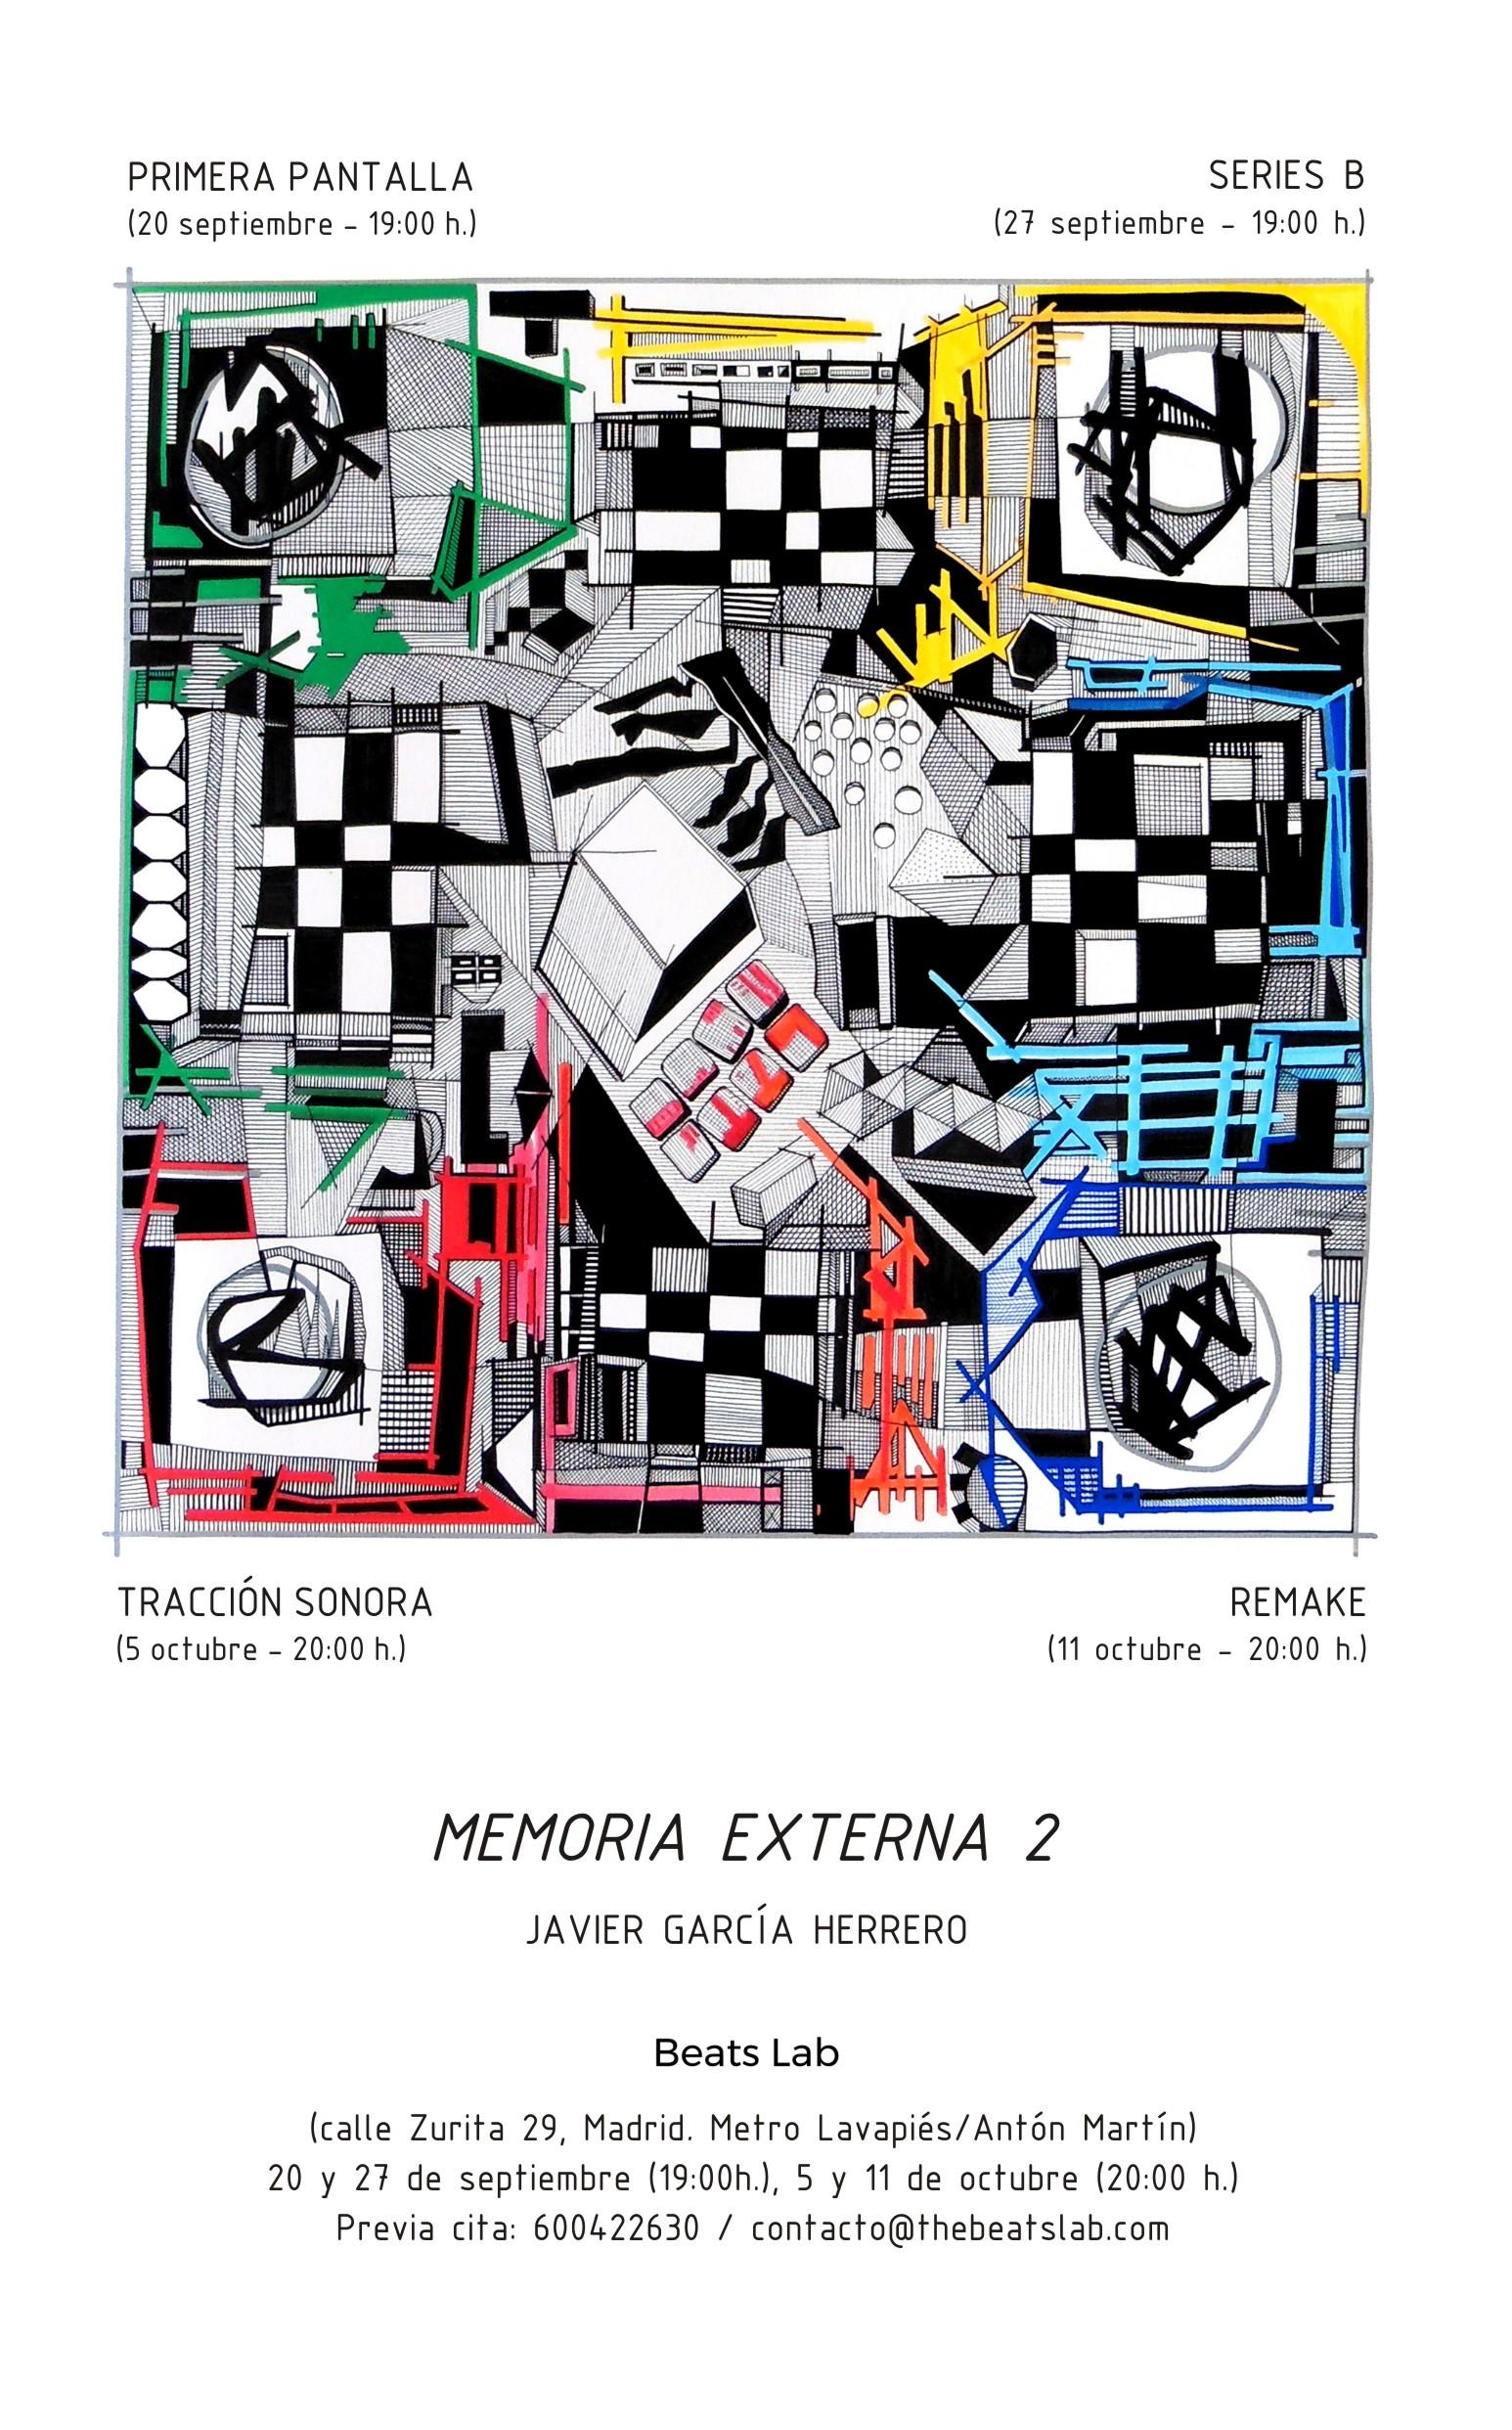 invitacion-Memoria Externa 2-Javier Garcia Herrero.jpg